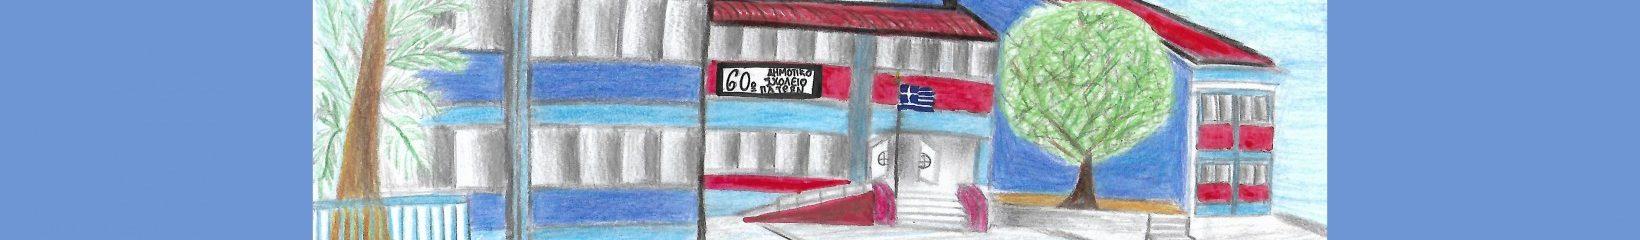 60o Δημοτικό Σχολείο Πάτρας